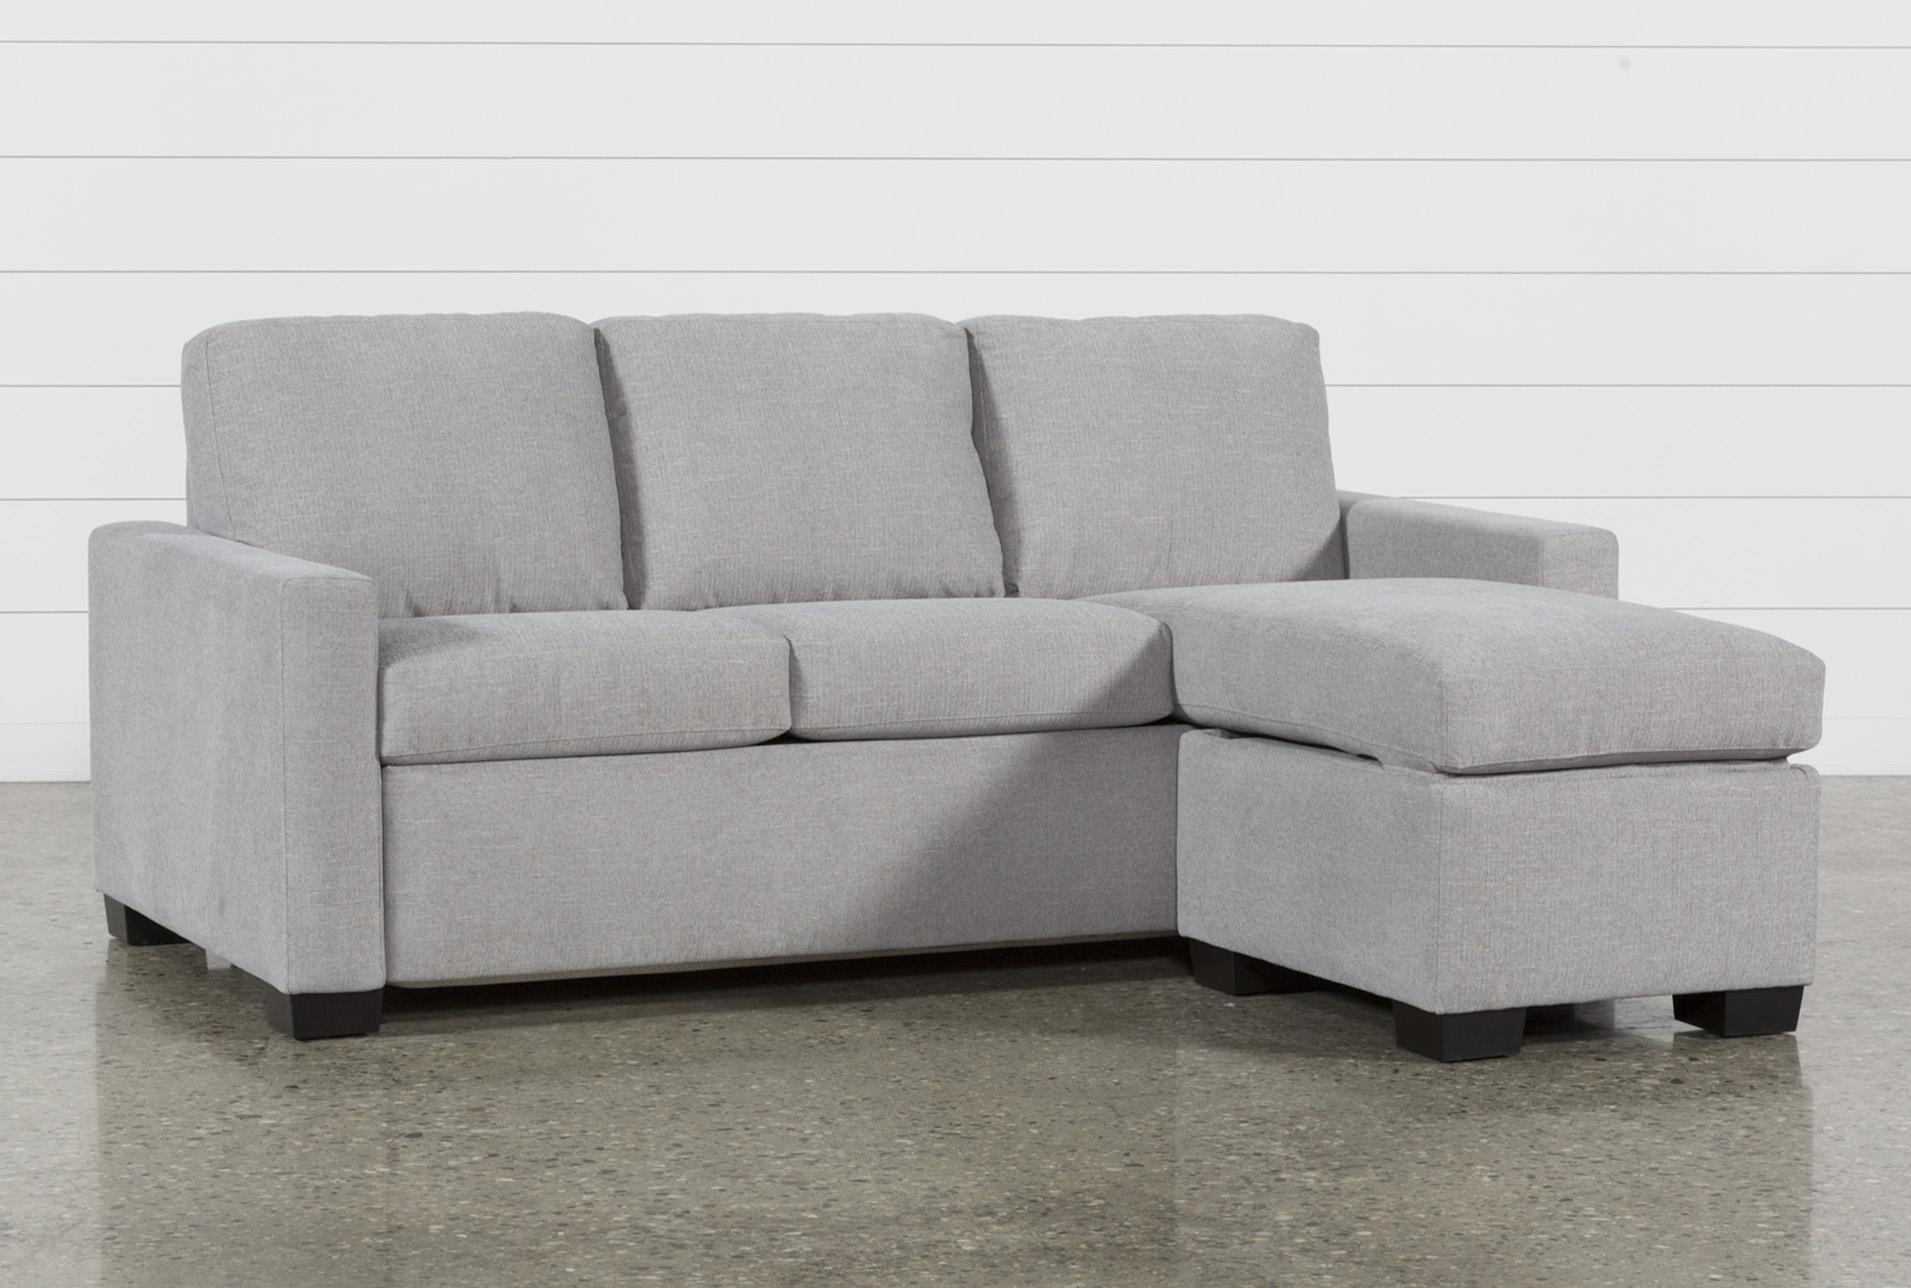 mackenzie silverpine queen plus sofa sleeper w/ storage chaise | living  spaces IGQEBBH